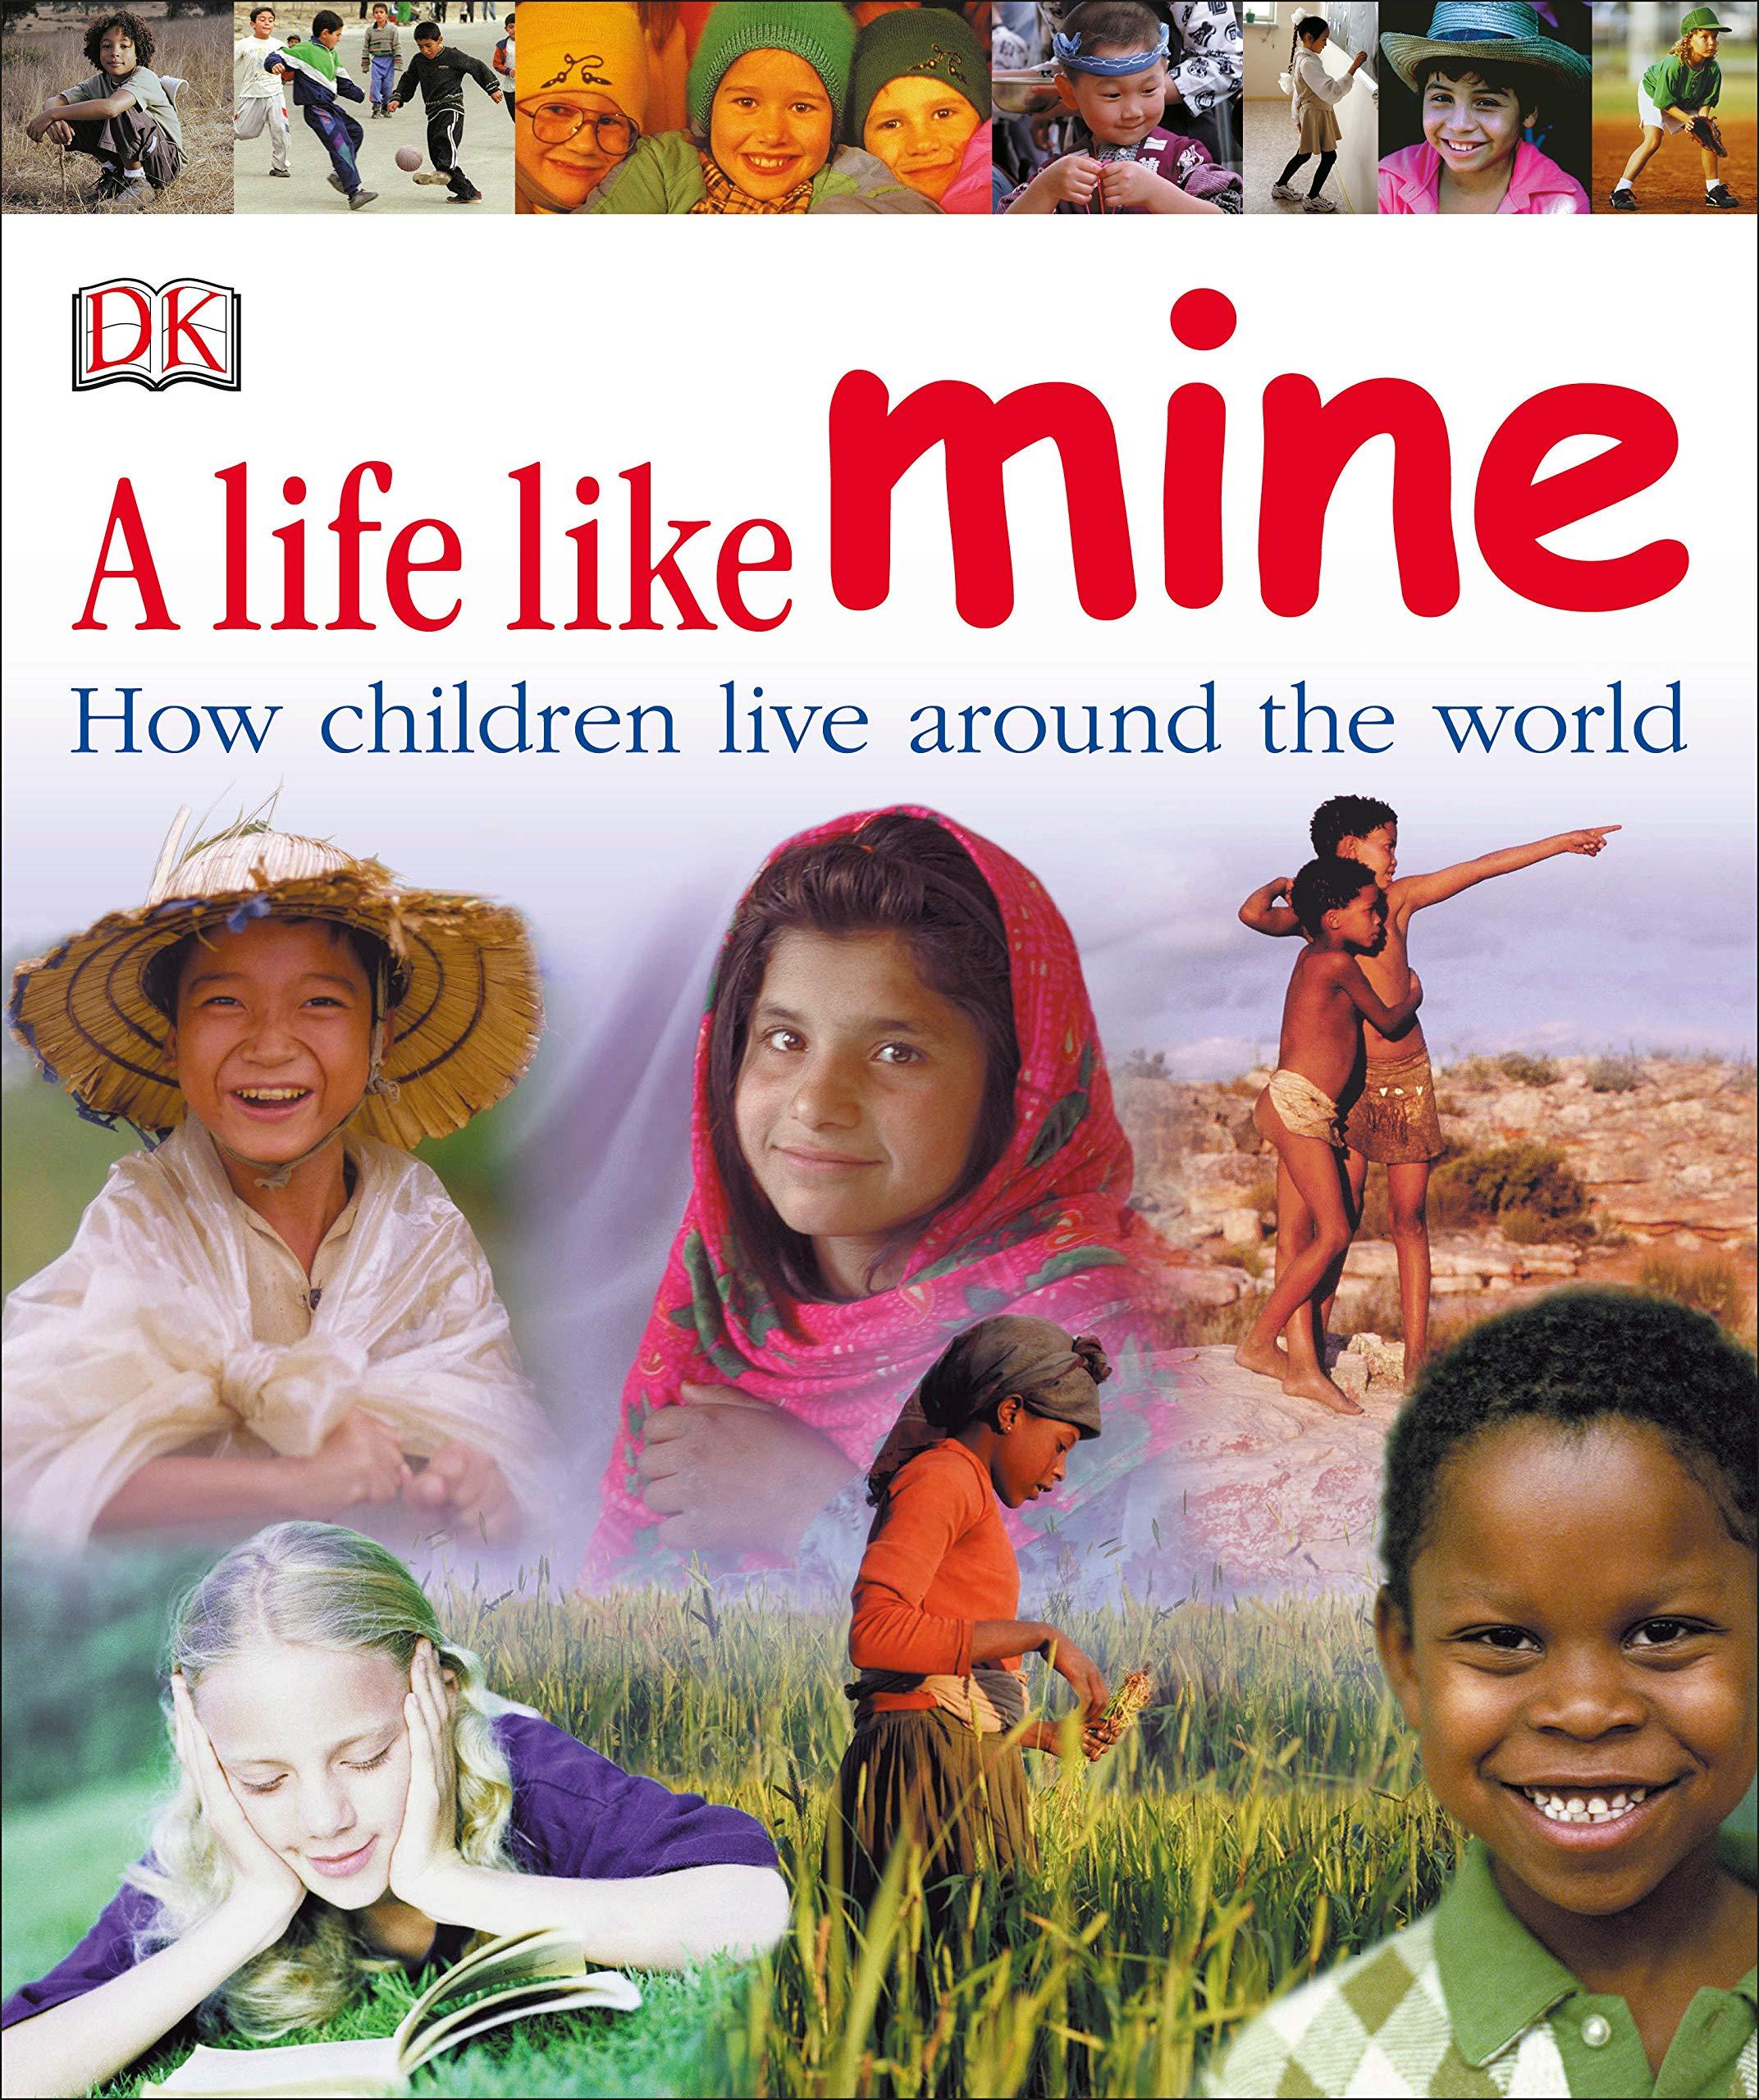 A Life Like Mine: How Children Live Around the World: DK: 9780756618032:  Amazon.com: Books